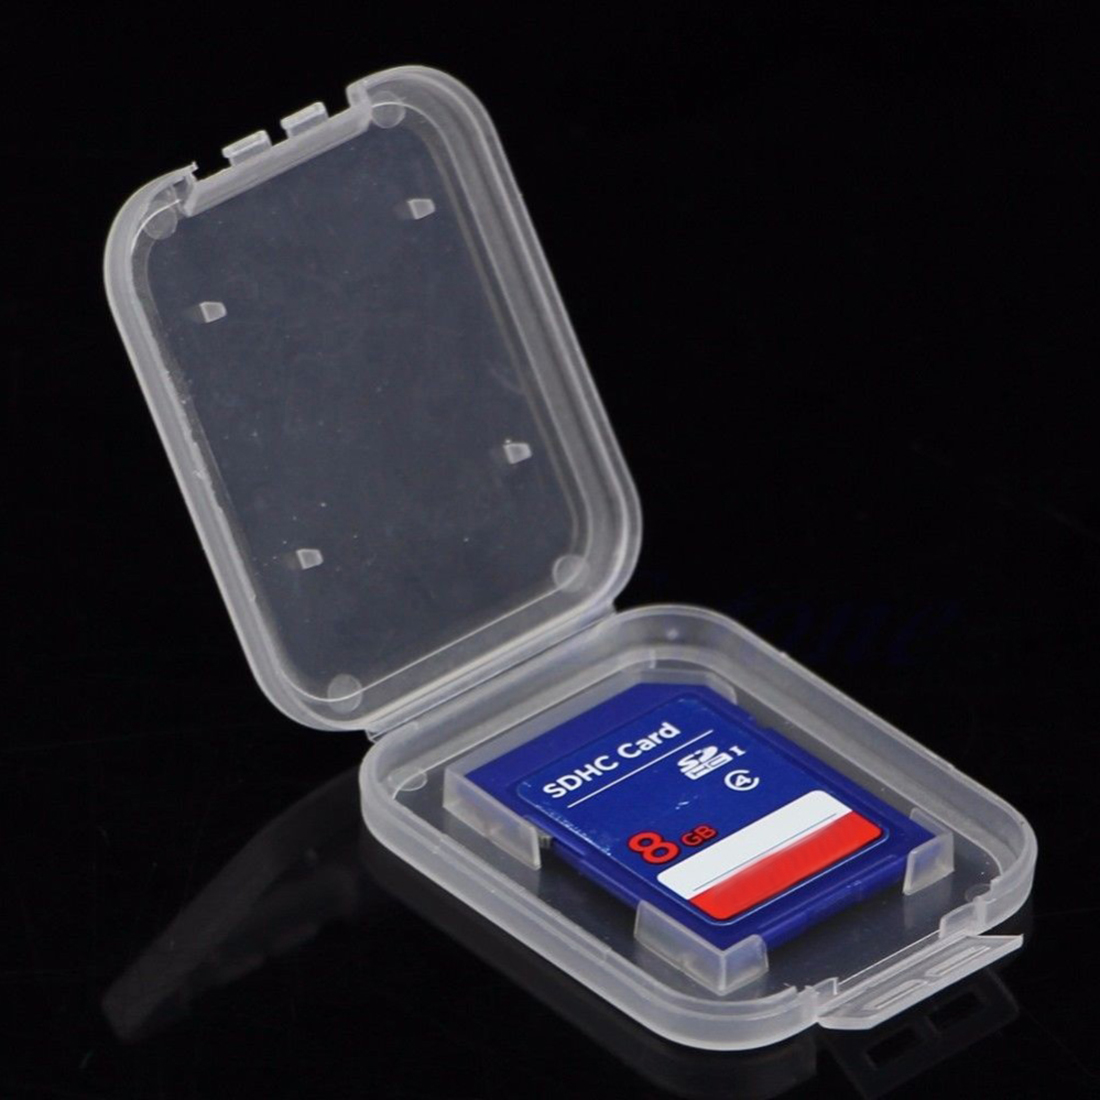 NOYOKERE 10Pcs SD SDHC Memory Card Case Holder Protector Transparent Plastic Box Storage Cases